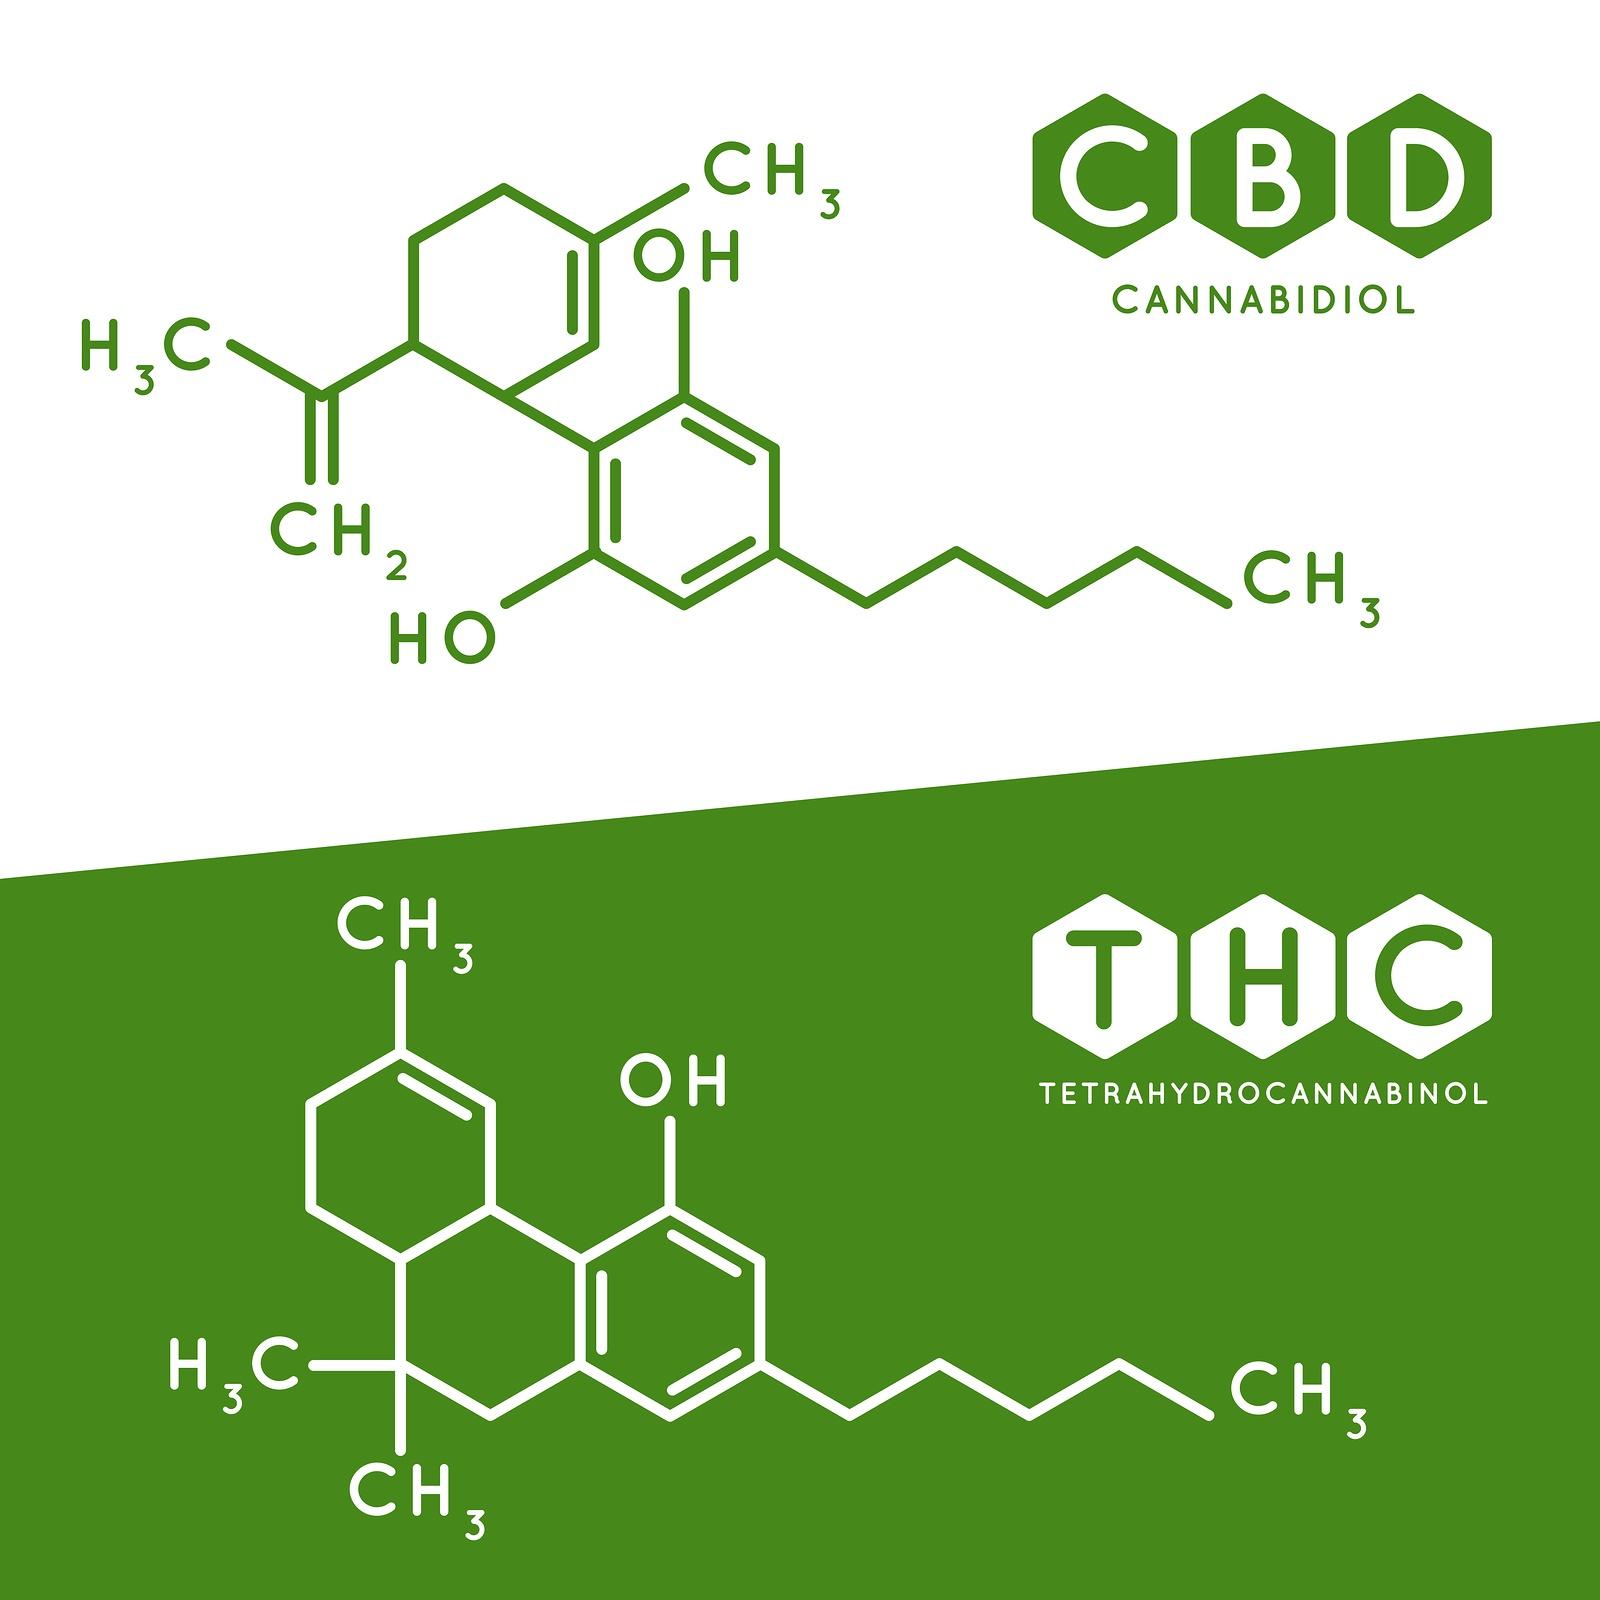 Prohibiting THC